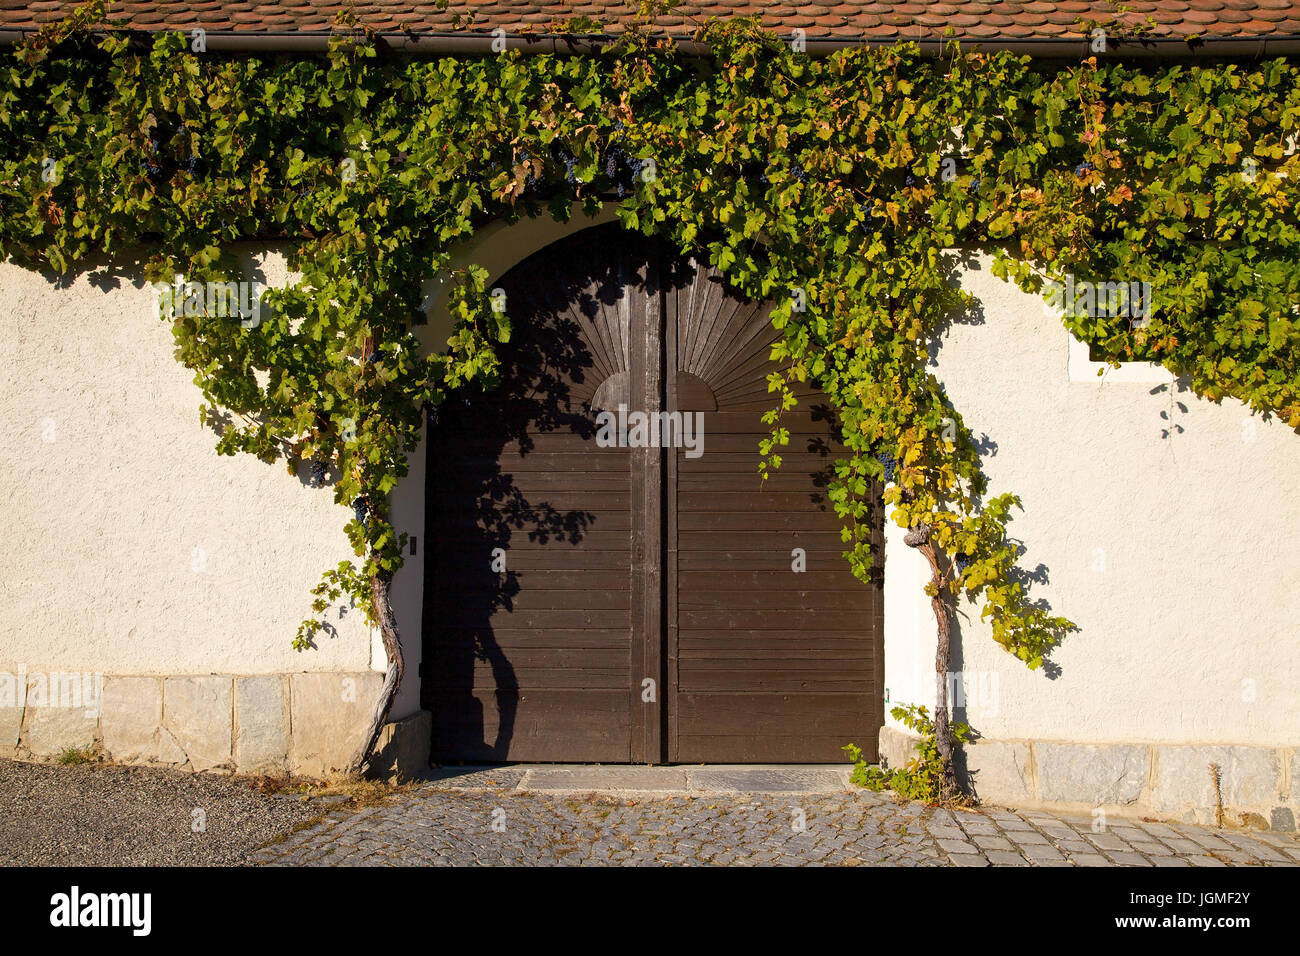 With wine umranktes court gate in spitz / the Danube, Austria, Lower Austria, Wachau - yard gate in spitz / the Danube, Austria, Lower Austria, Wachau Stock Photo